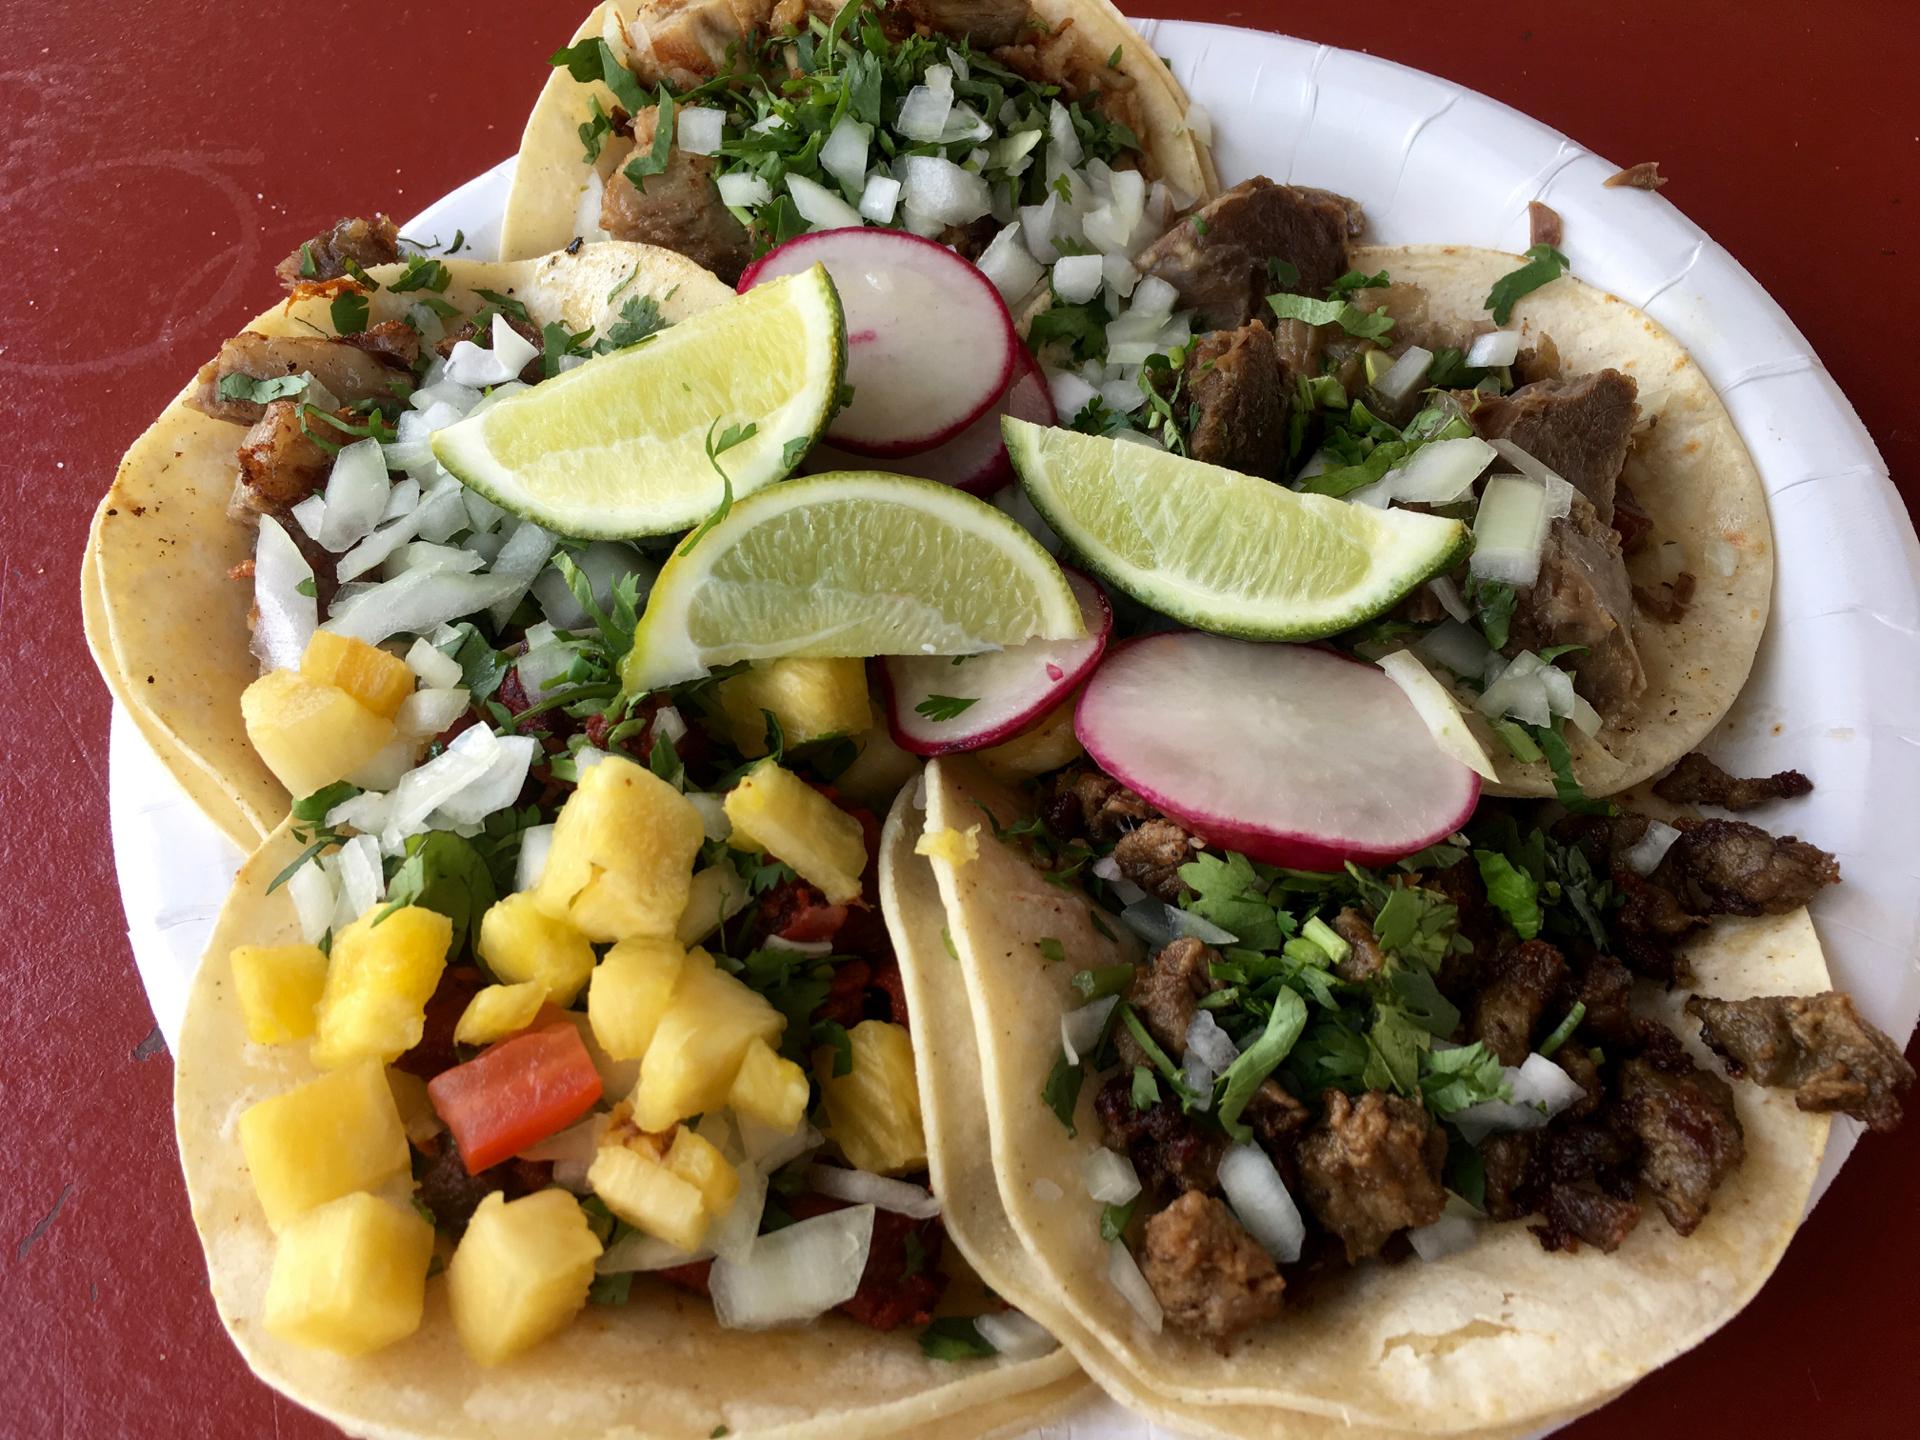 A plate of tacos at Tacomania.